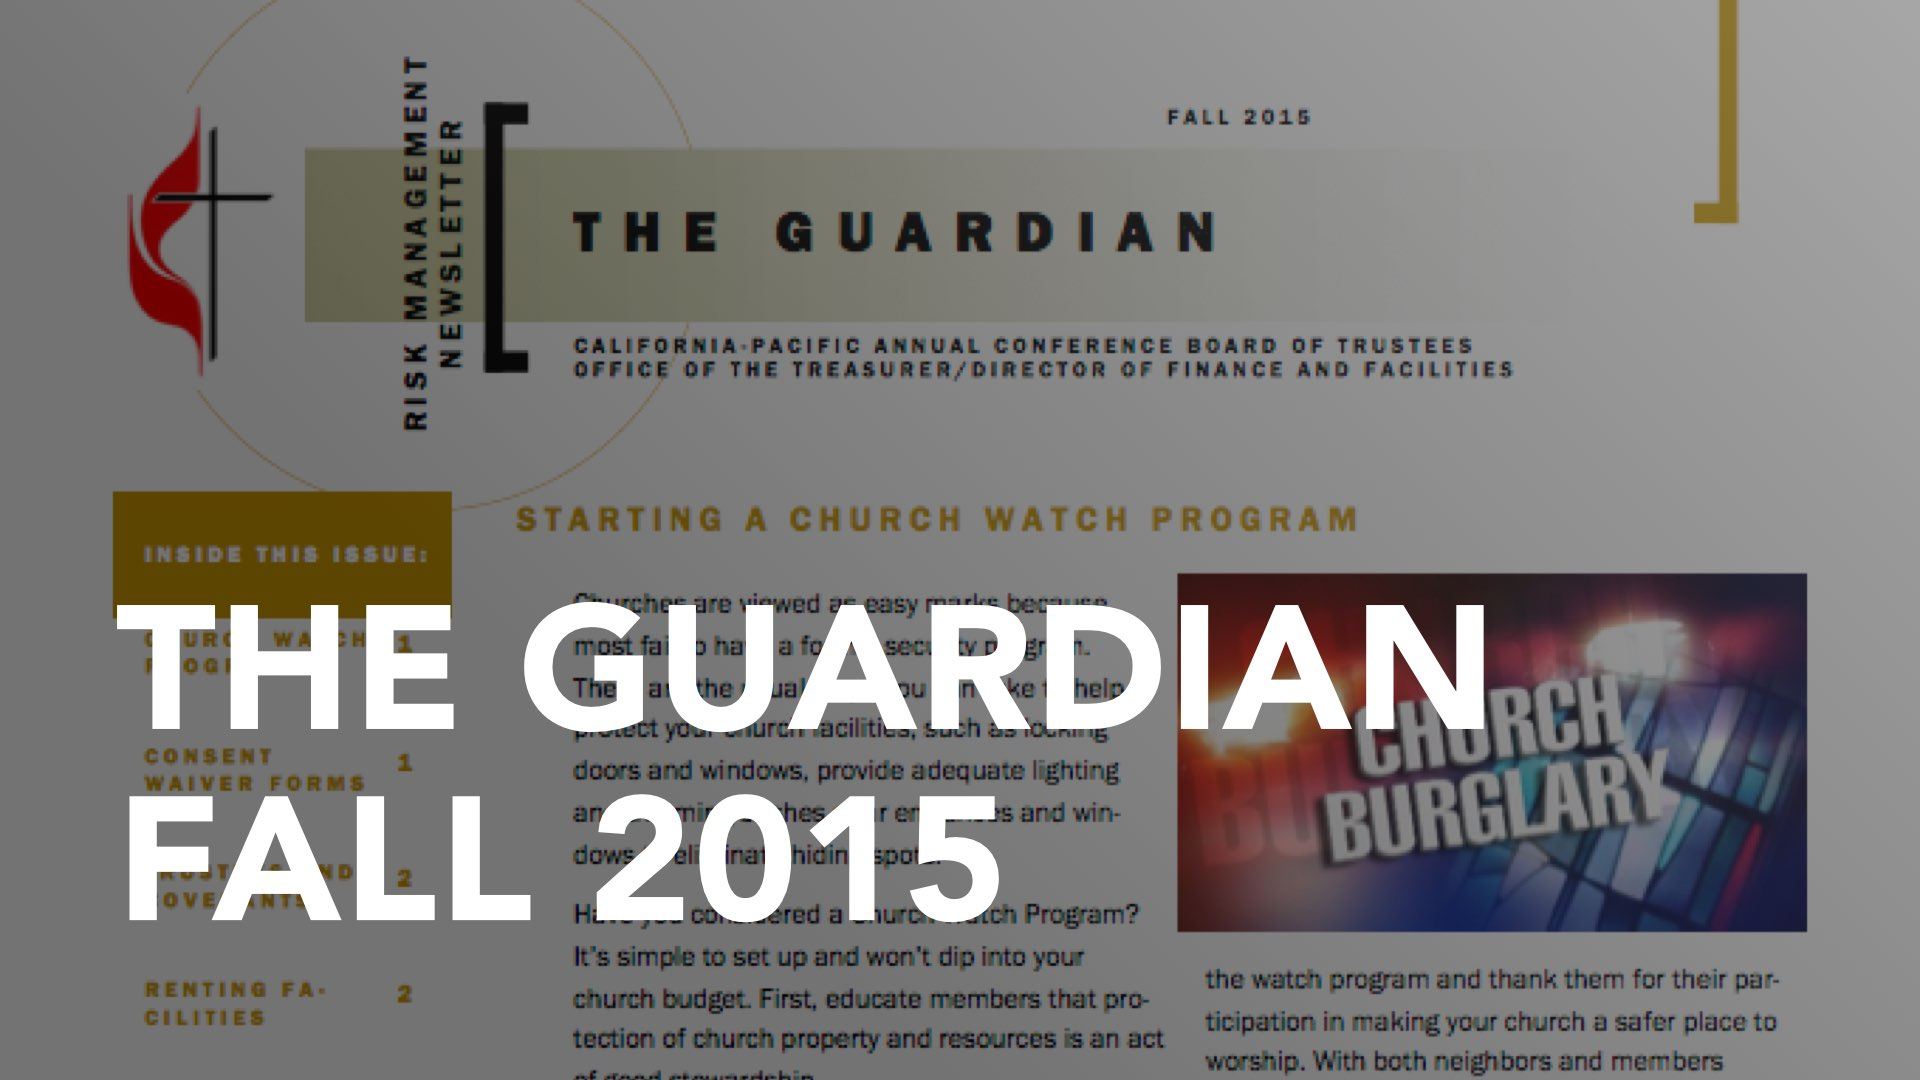 the-guardian-fall-2015